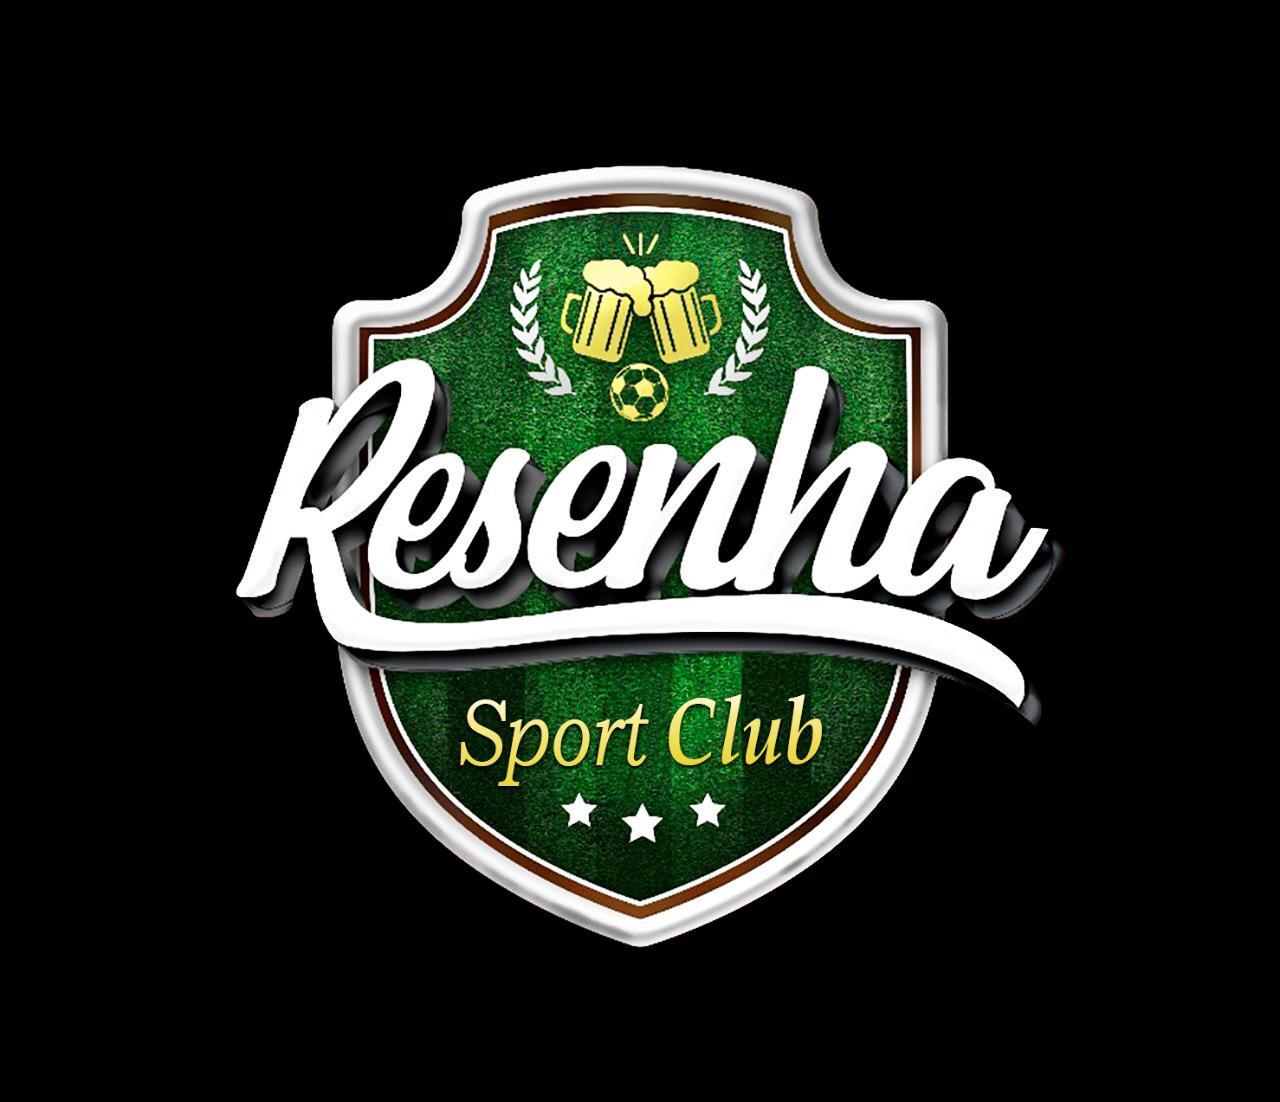 Resenha Sport Club